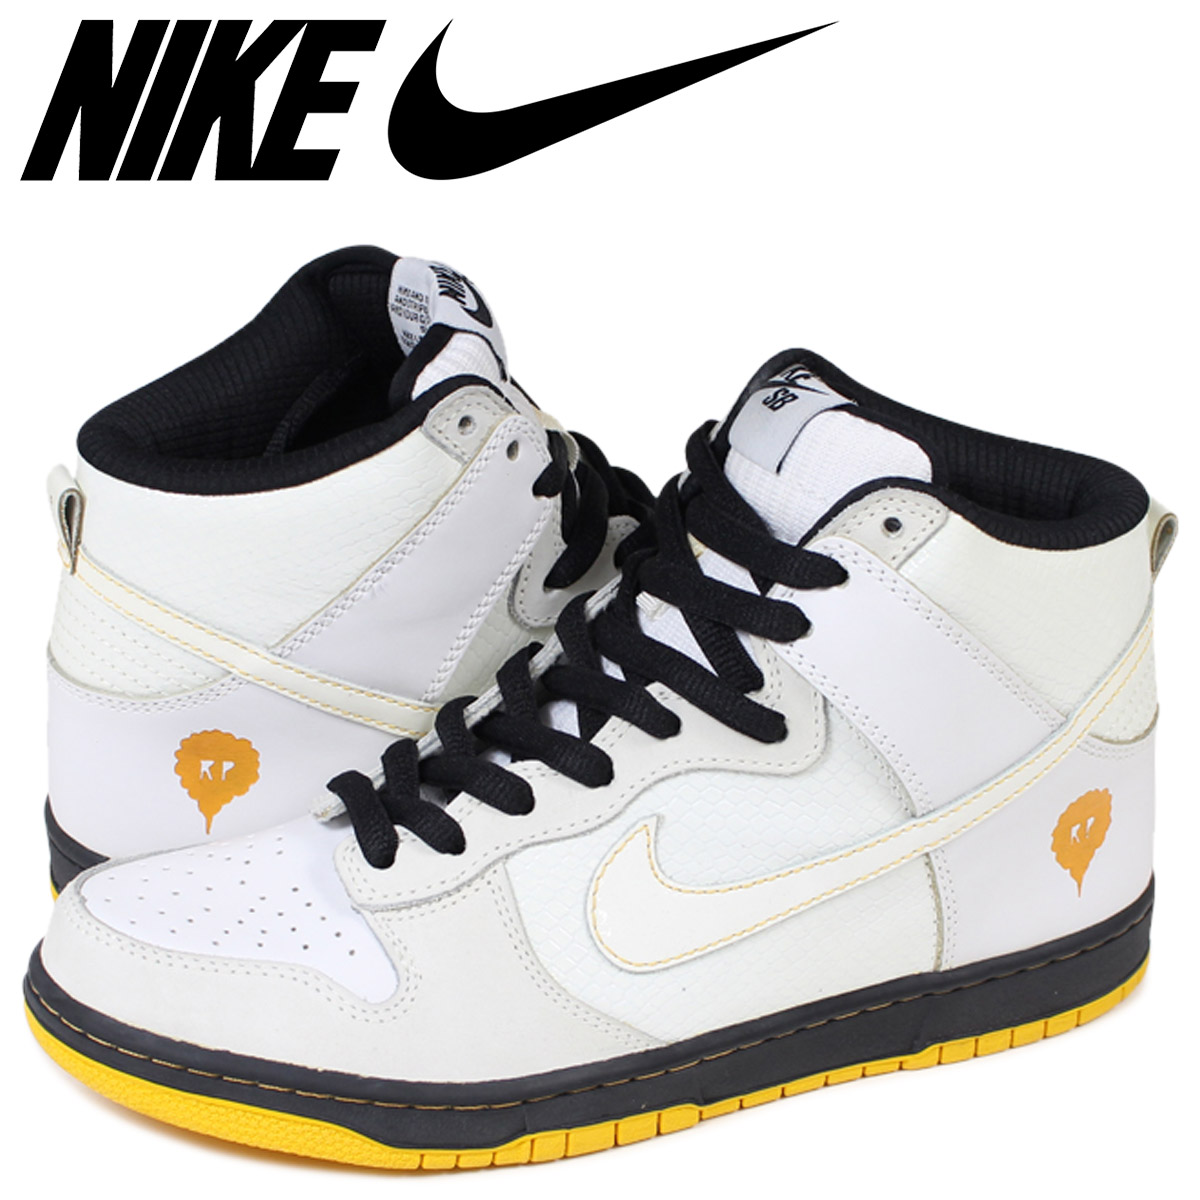 quality design 4d8a8 c8731 ALLSPORTS Nike NIKE dunk sneakers DUNK HI CUSTOM SERIES MADE IN BRAZIL  320,701-102 white men  Rakuten Global Market